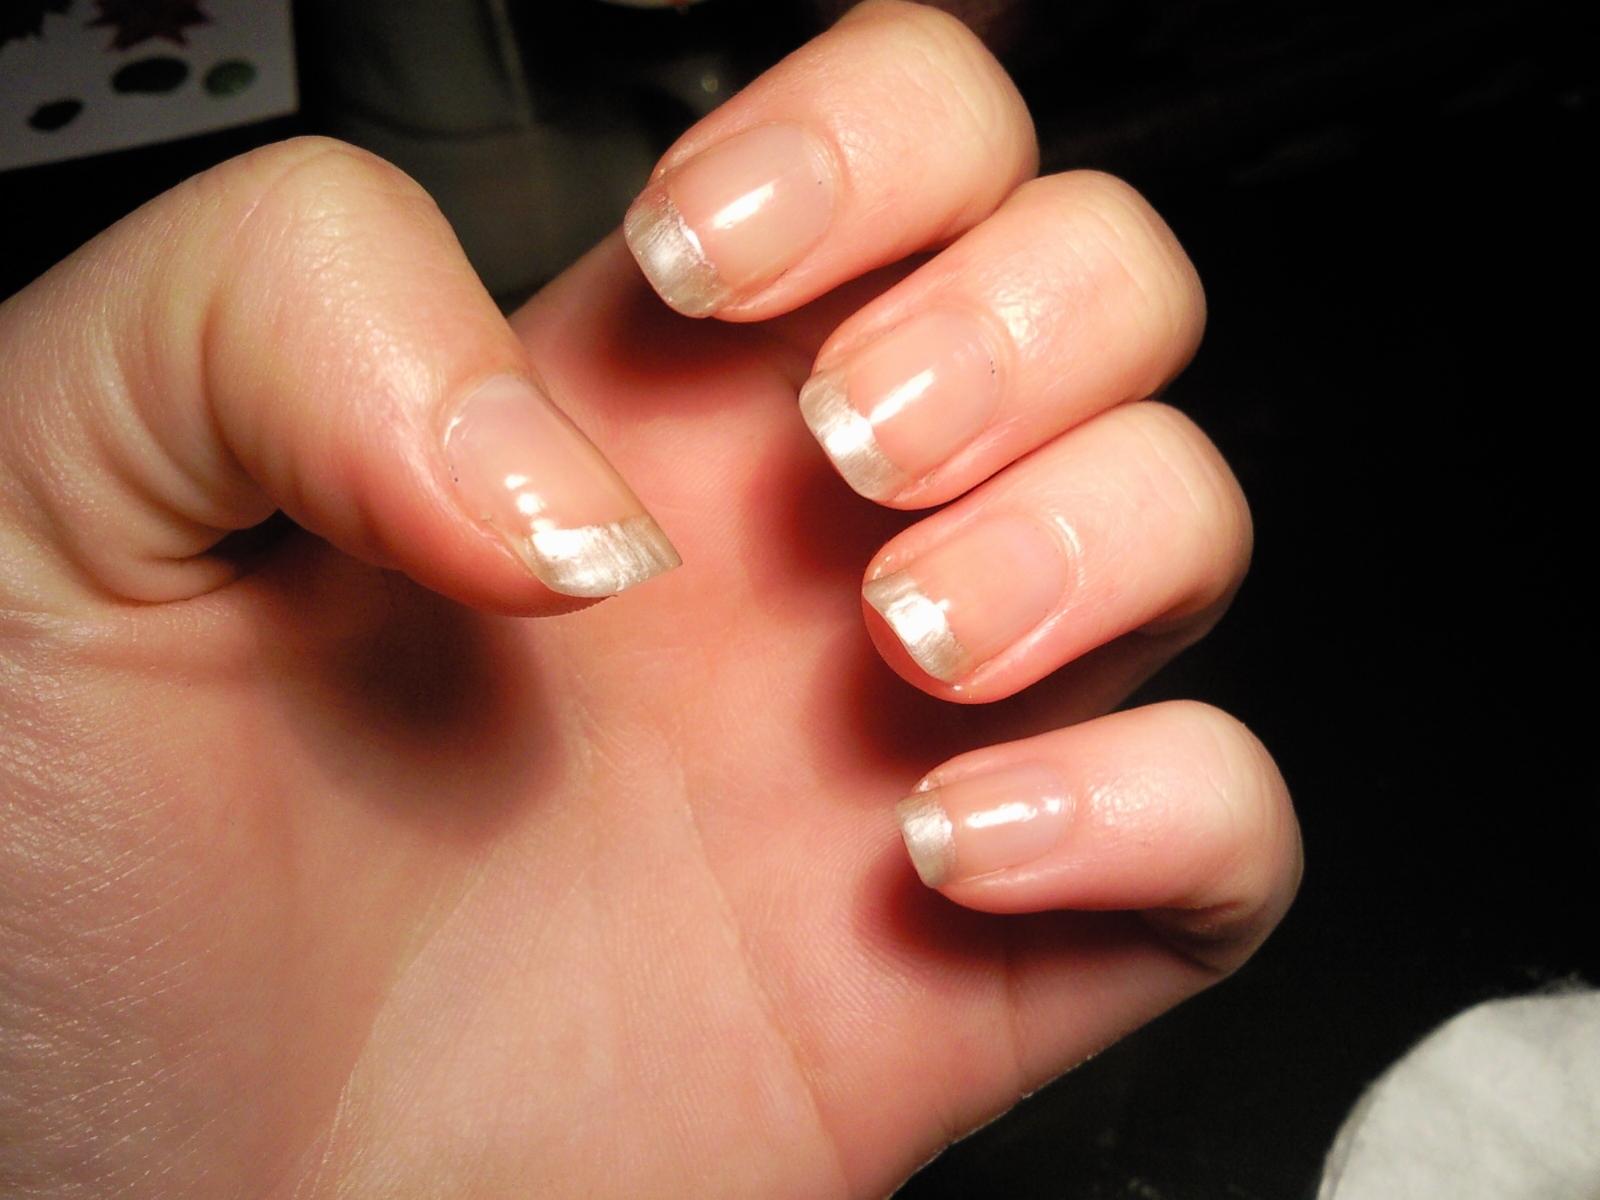 Manicura con flor de pascua poinsettia manicure nivel medio